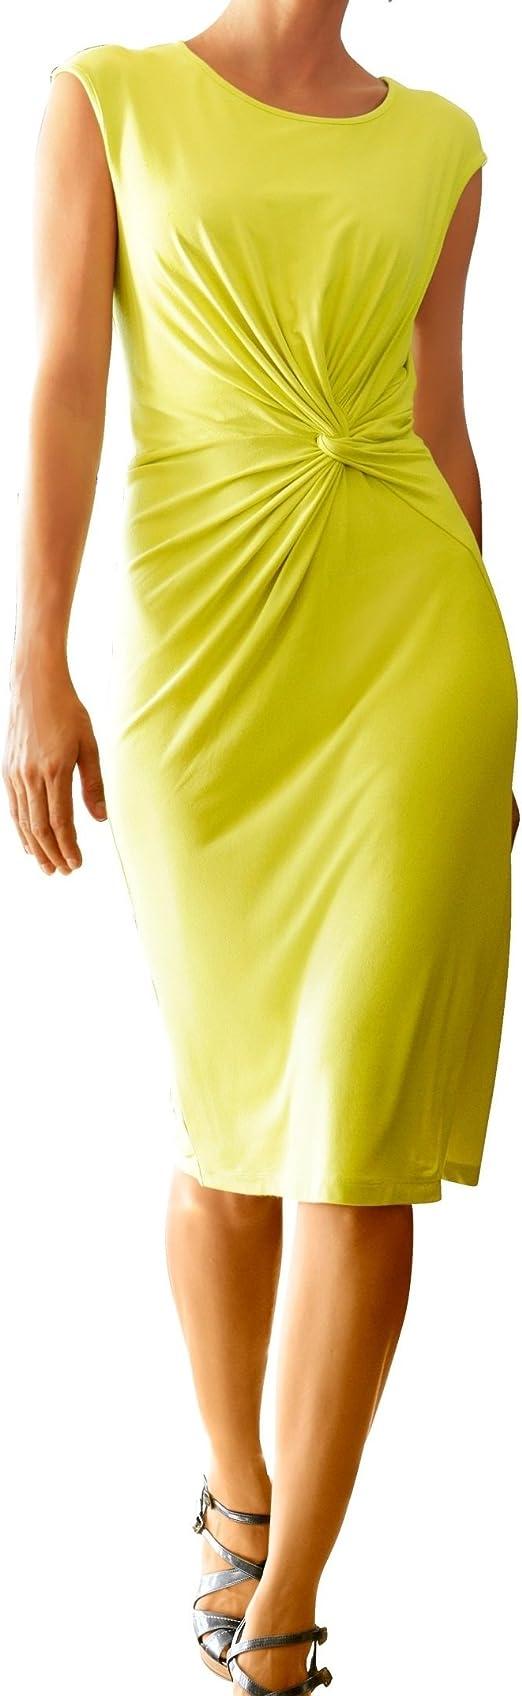 av Marken Jersey Kleid limonen grün Gr. 9, Gr. 9, Gr. 9 ...